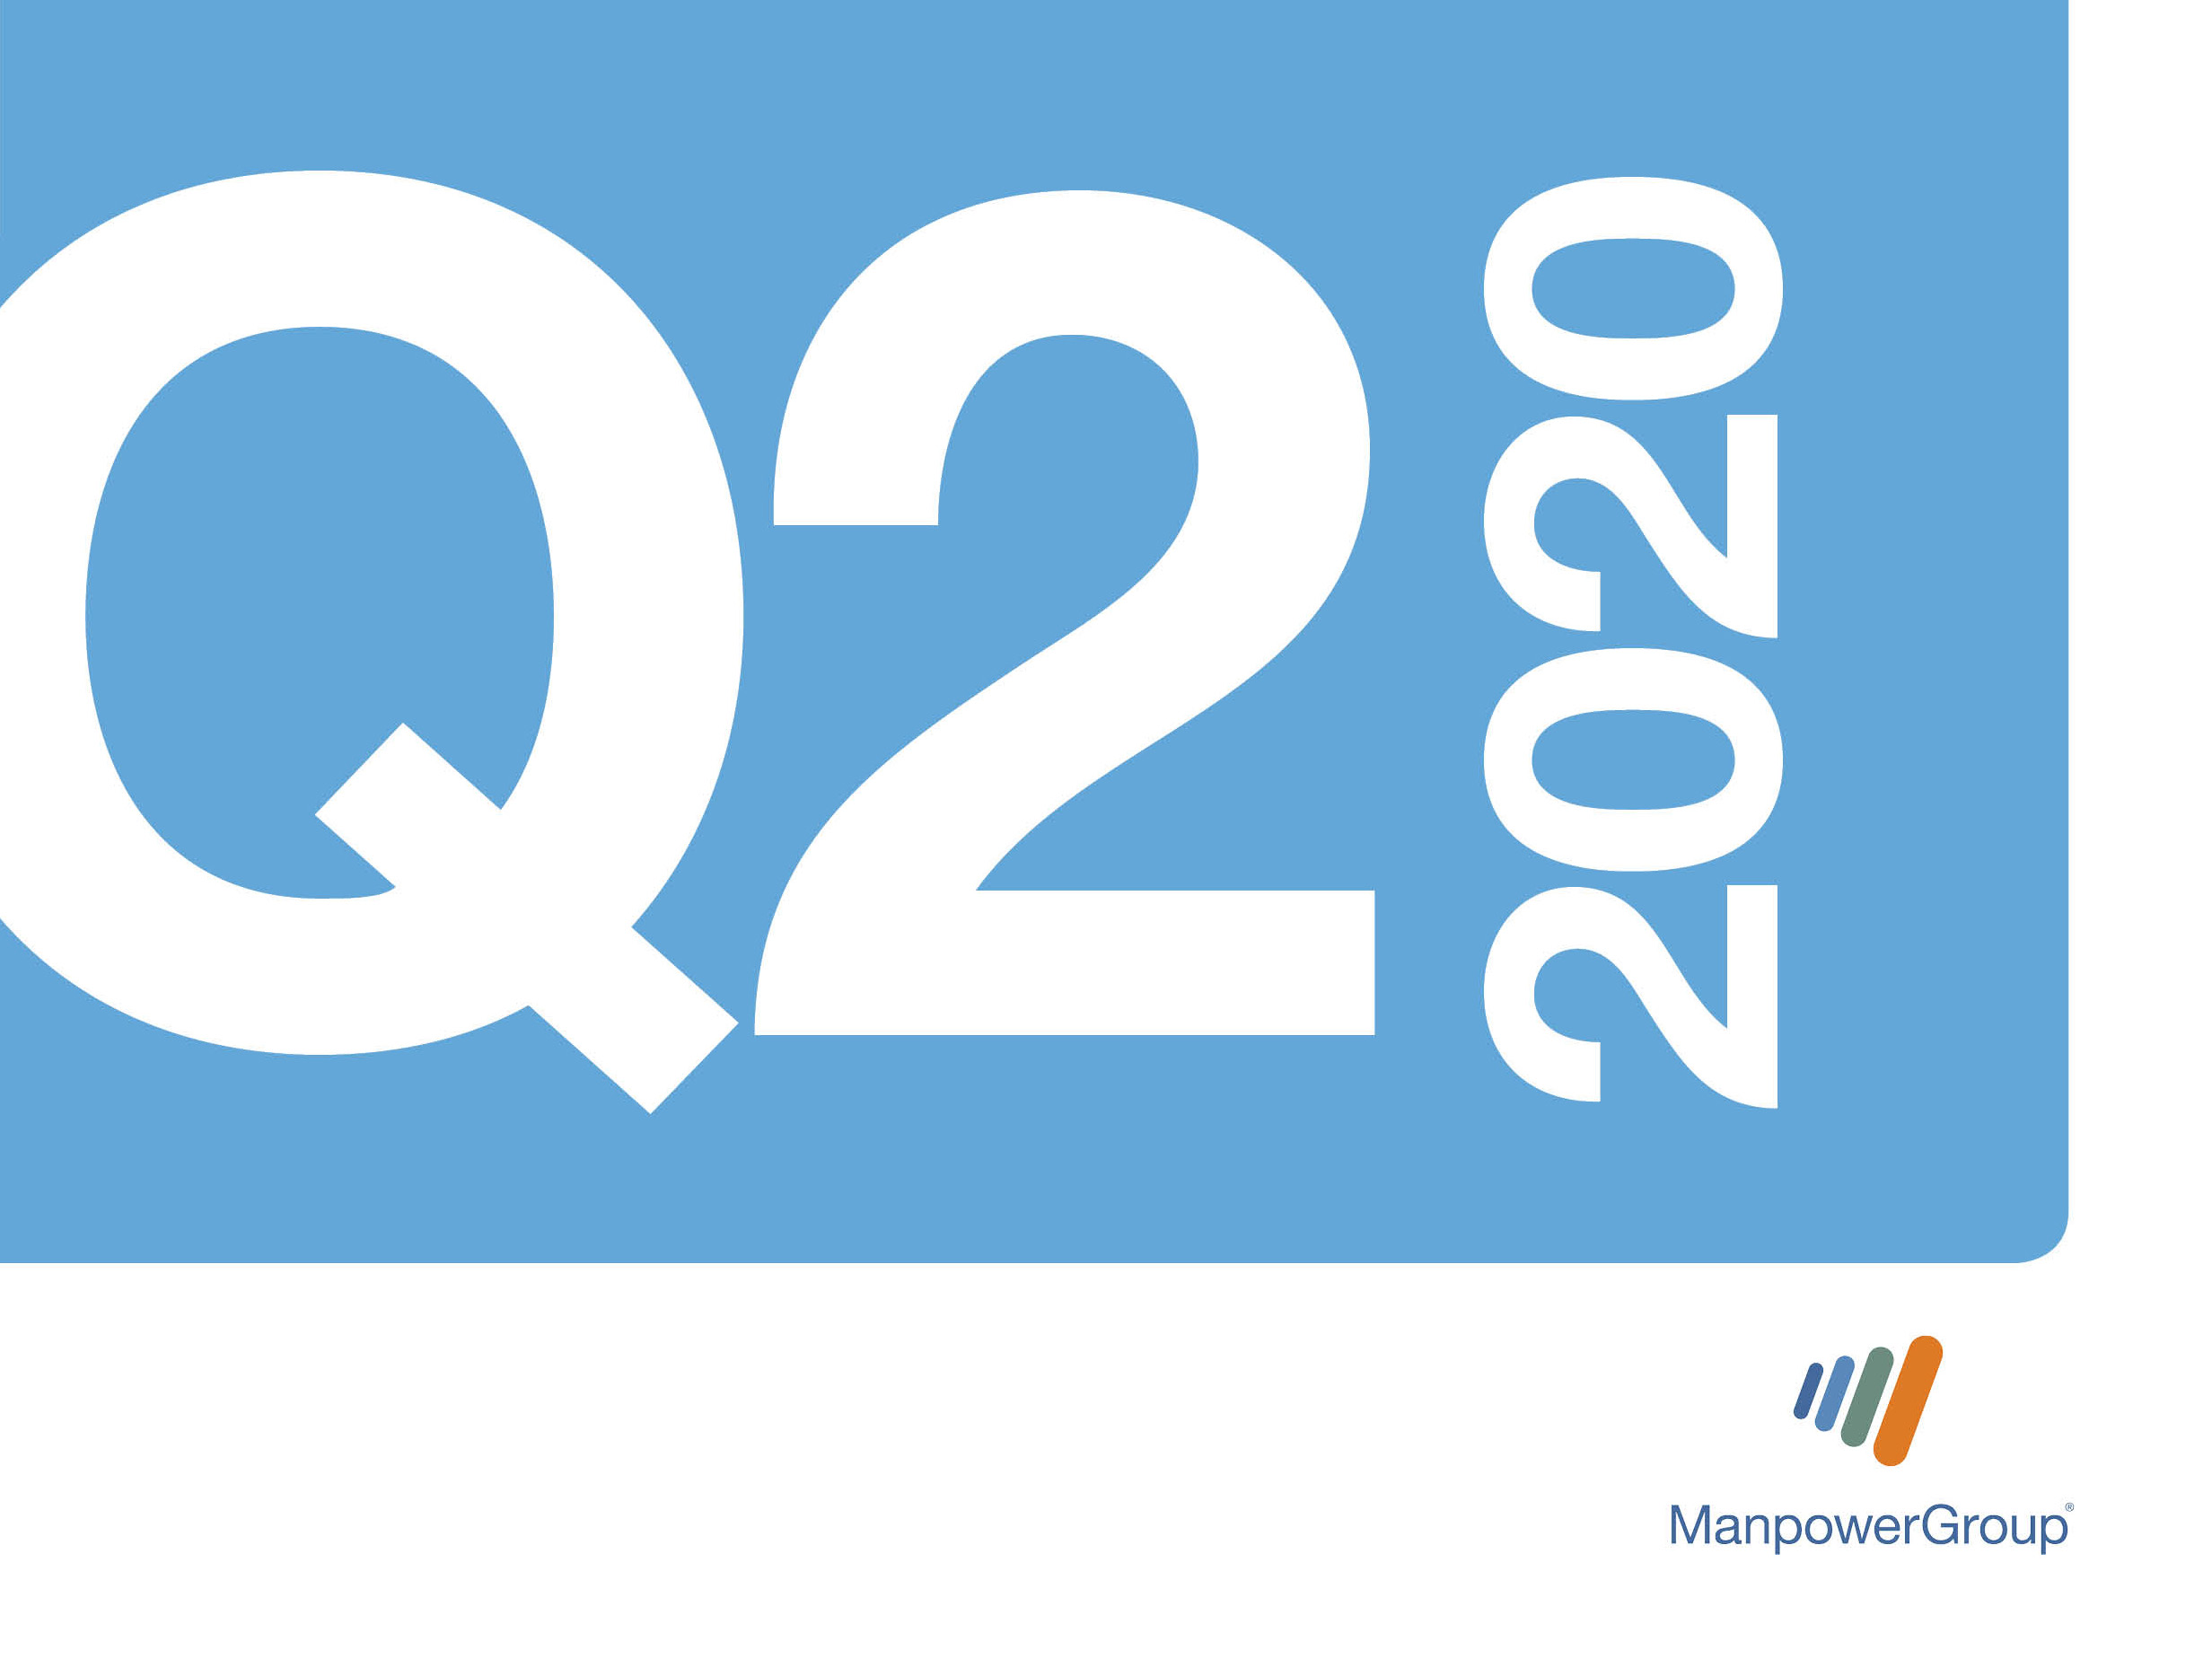 Q220 ManpowerGroup Employment Outlook Survey